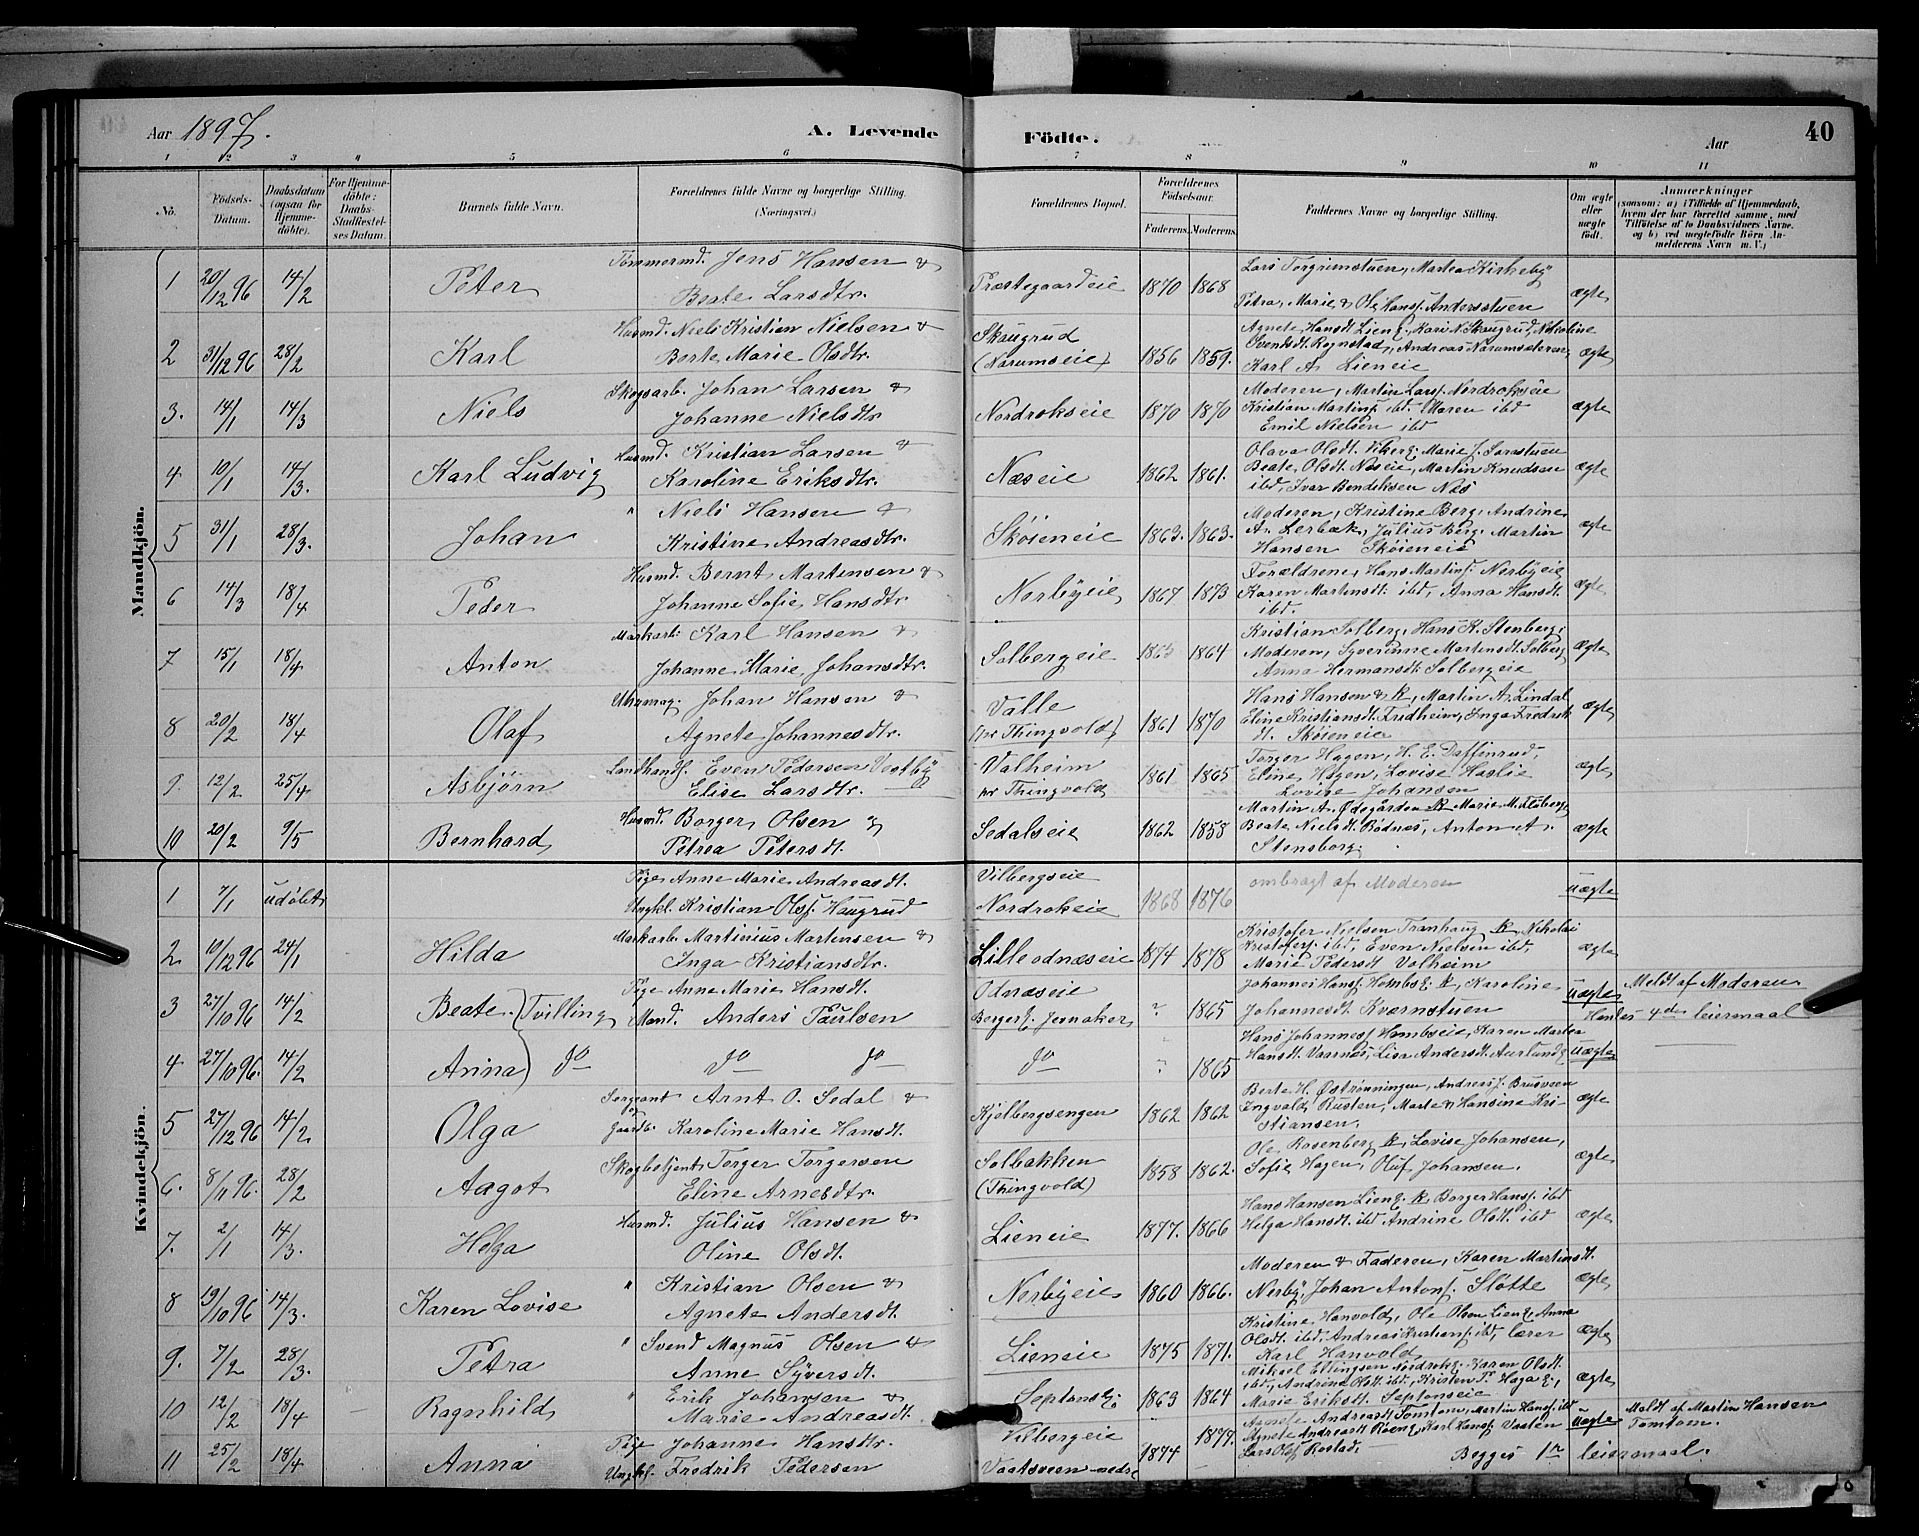 SAH, Søndre Land prestekontor, L/L0003: Klokkerbok nr. 3, 1884-1902, s. 40